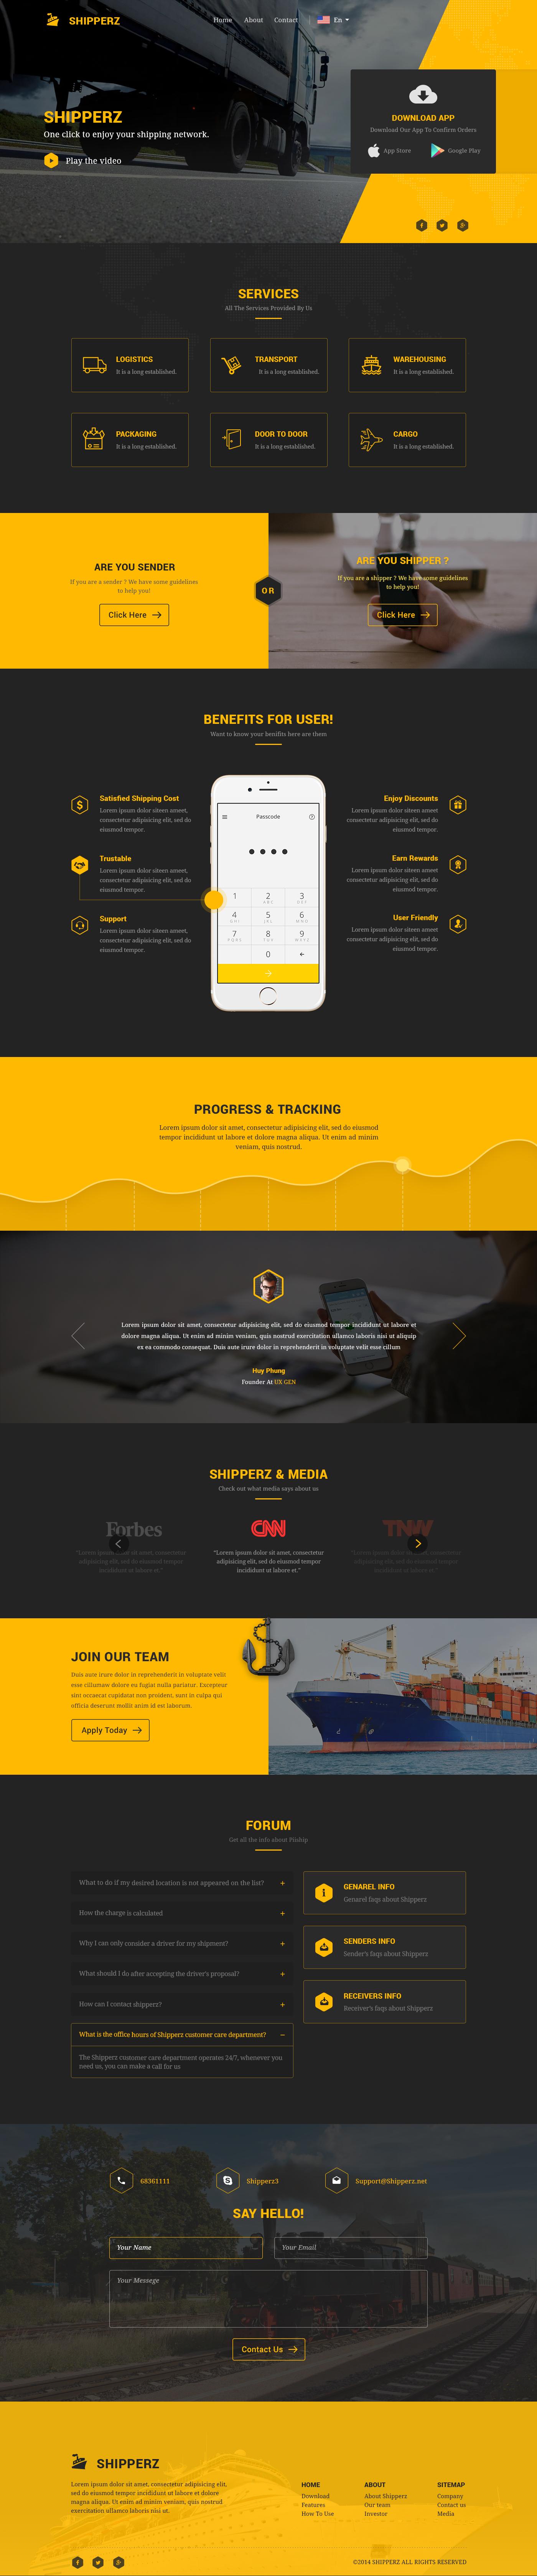 Full Preview Jpg By Mushfiq Web Layout Design Web Design Creative Web Design